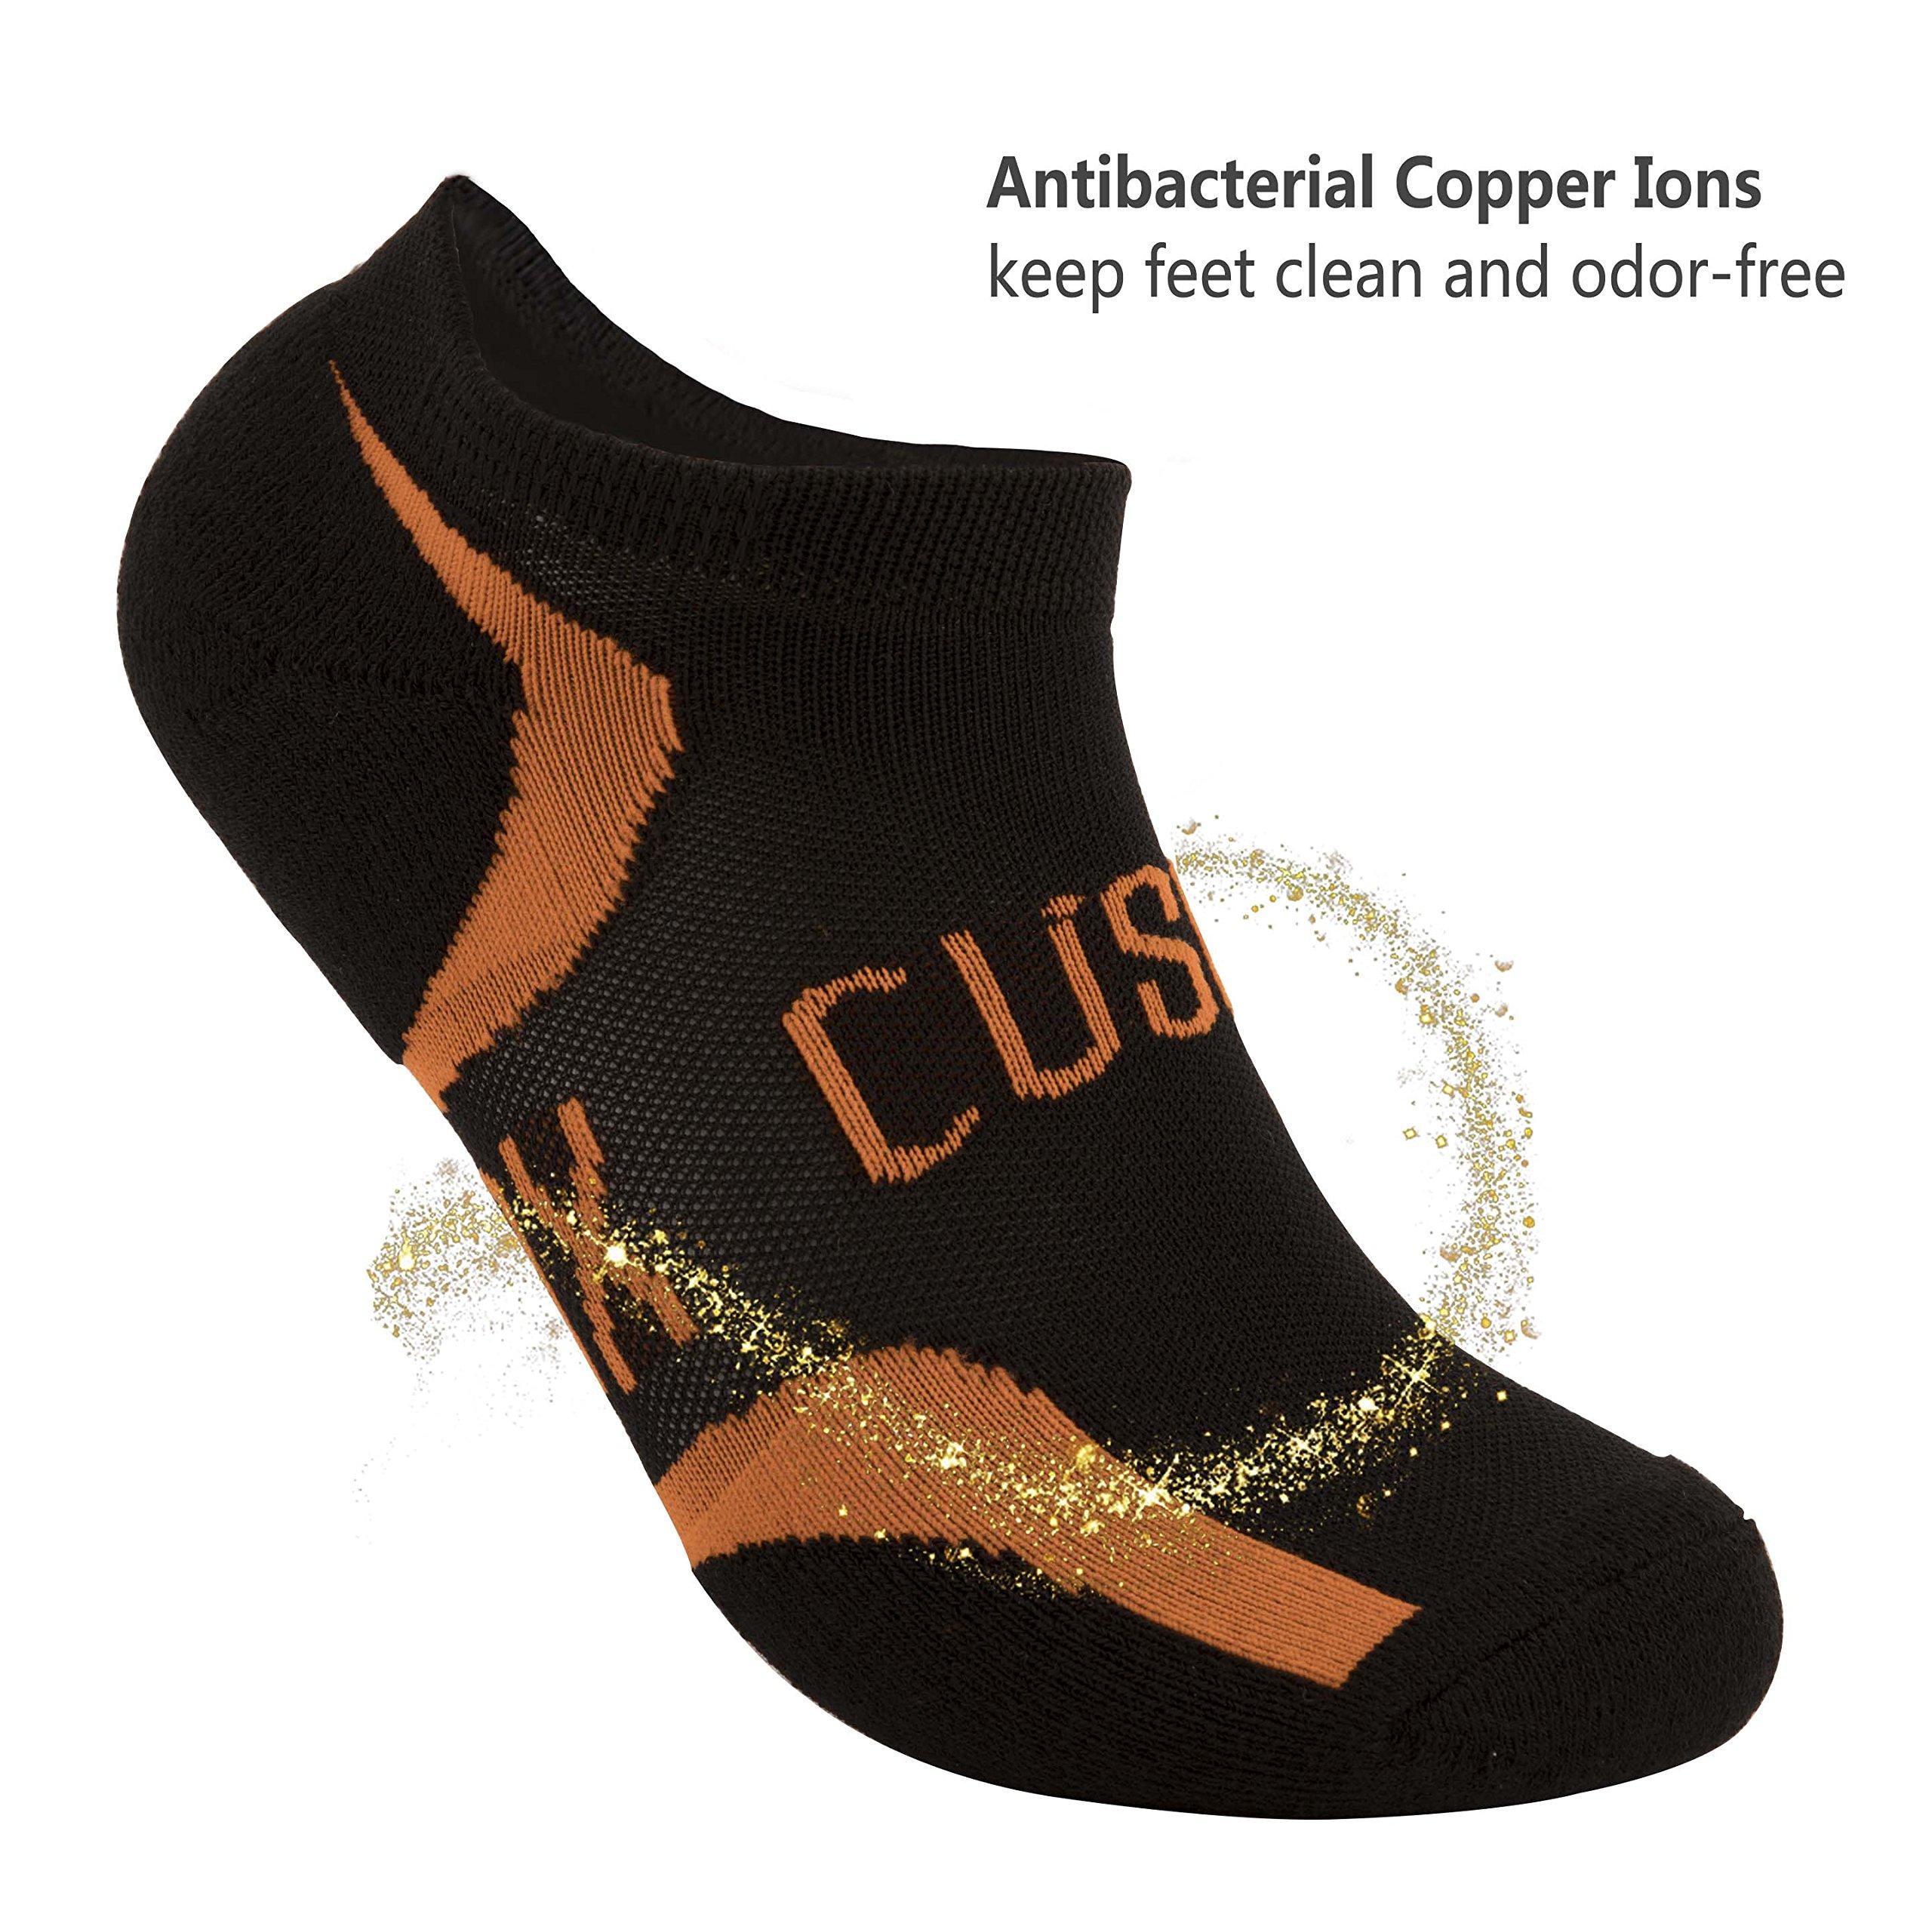 CUSOX Men\'s No Show Antibacterial Odor Free Socks with Seamless Toe 2 Pairs